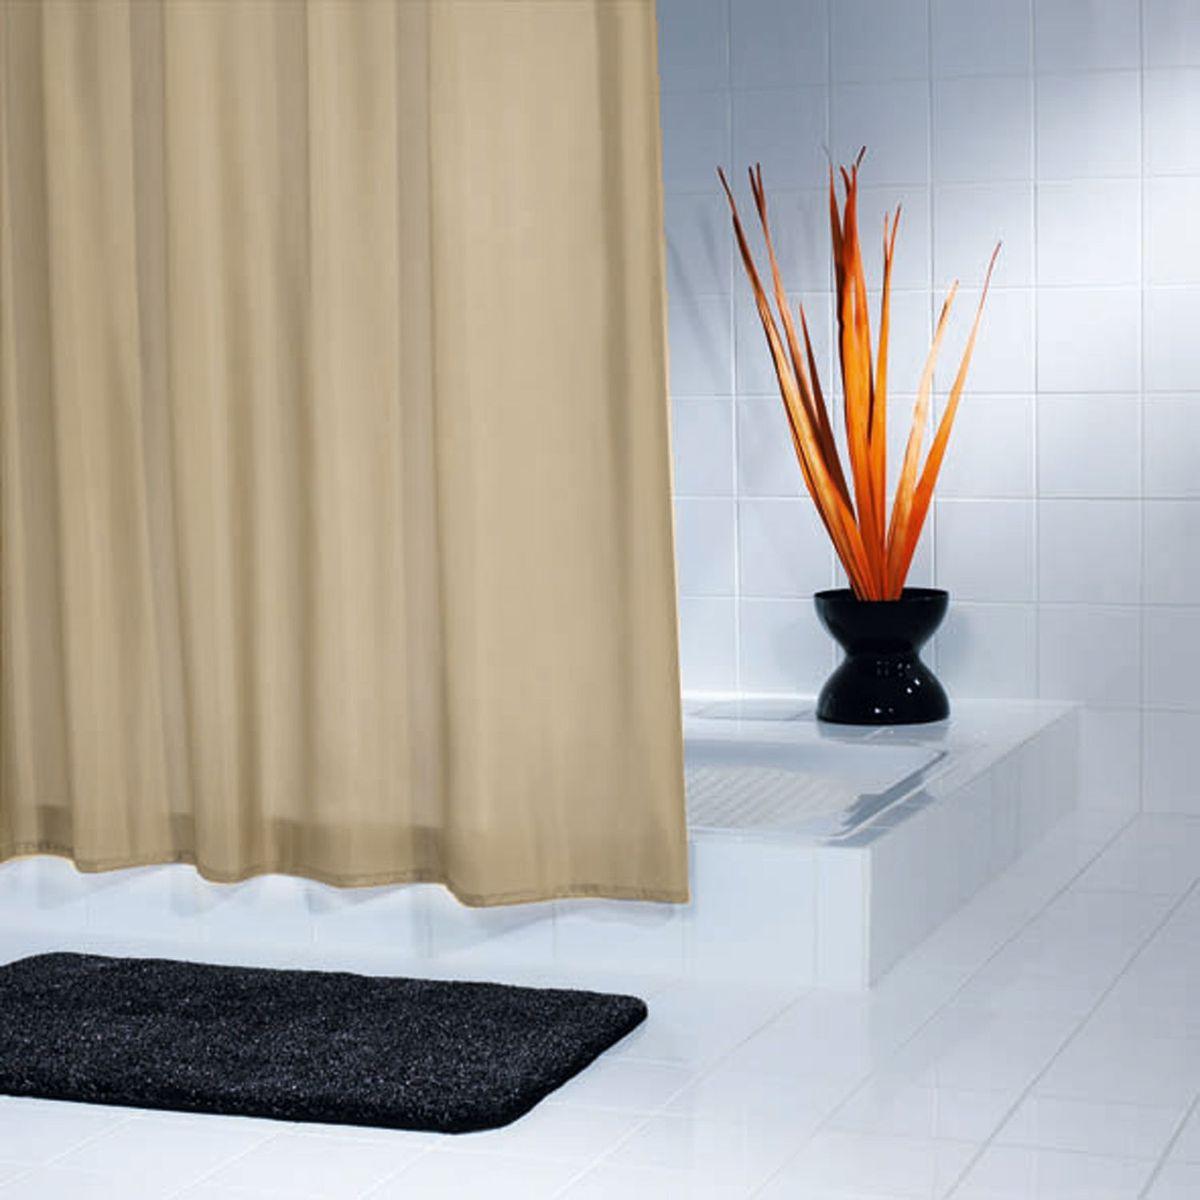 Штора для ванной комнаты Ridder Madison, цвет: бежевый, коричневый, 240 х 180 см